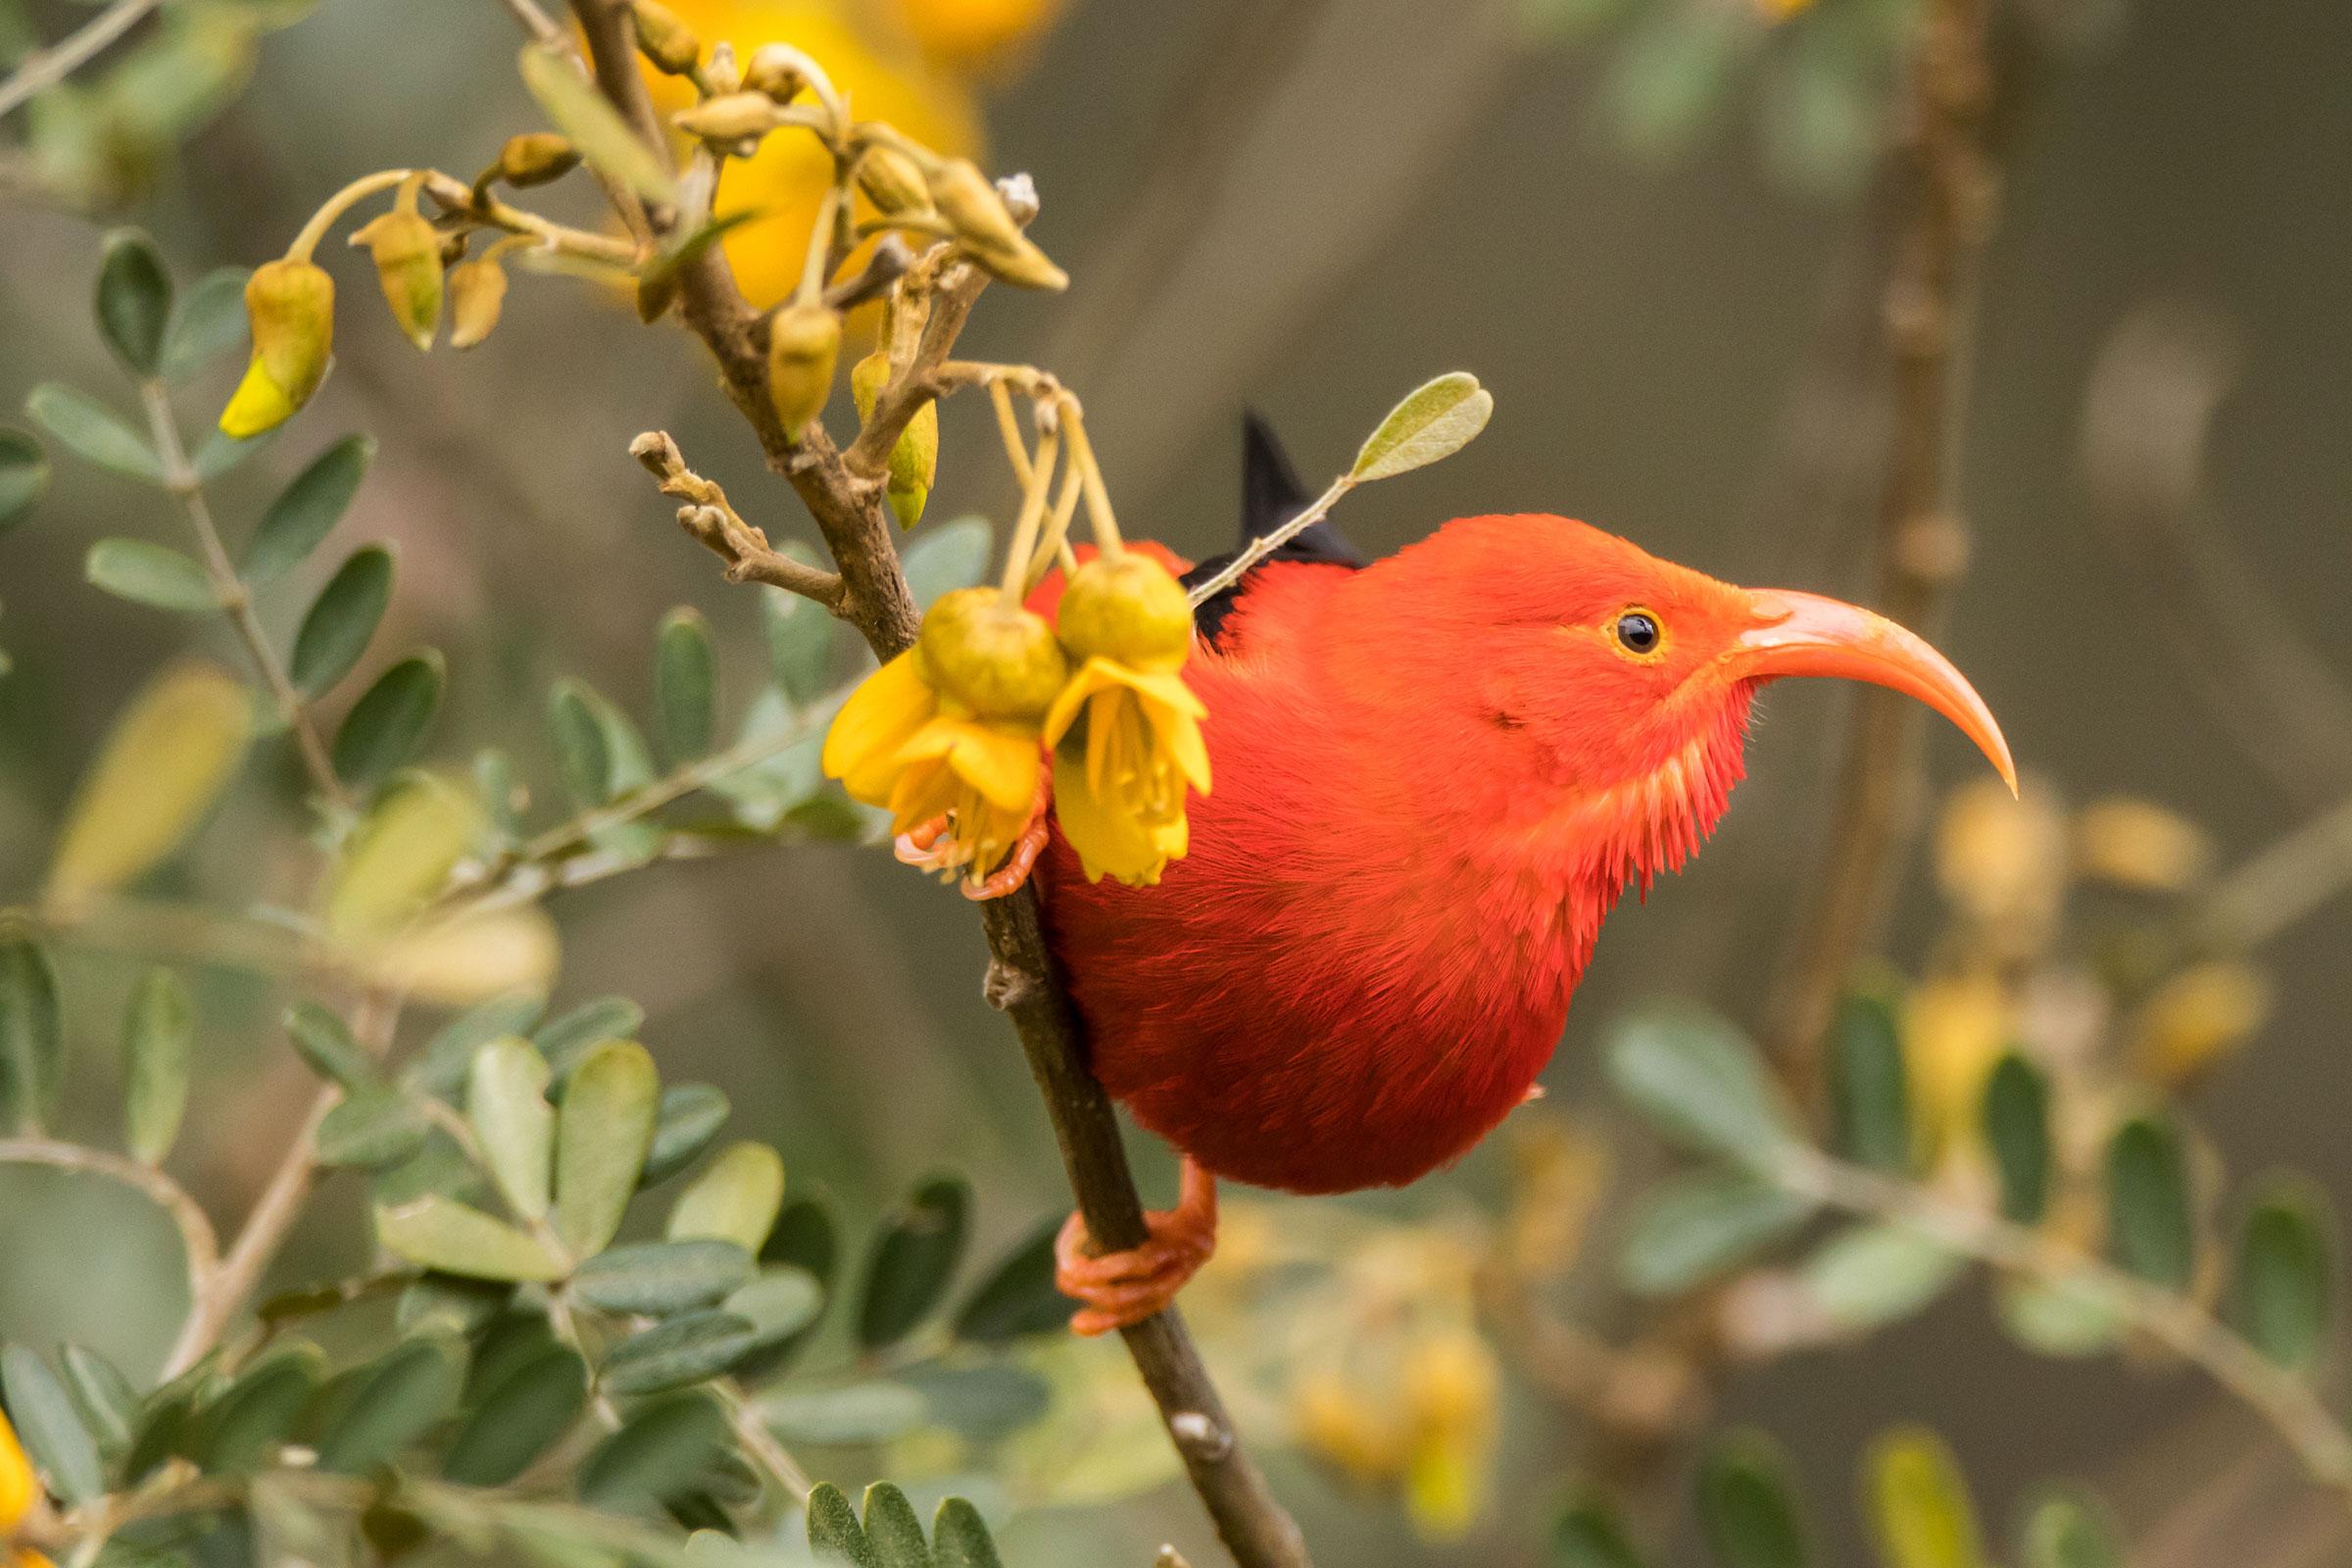 An ʻIʻiwi at Haleakala National Park in Hawaii.